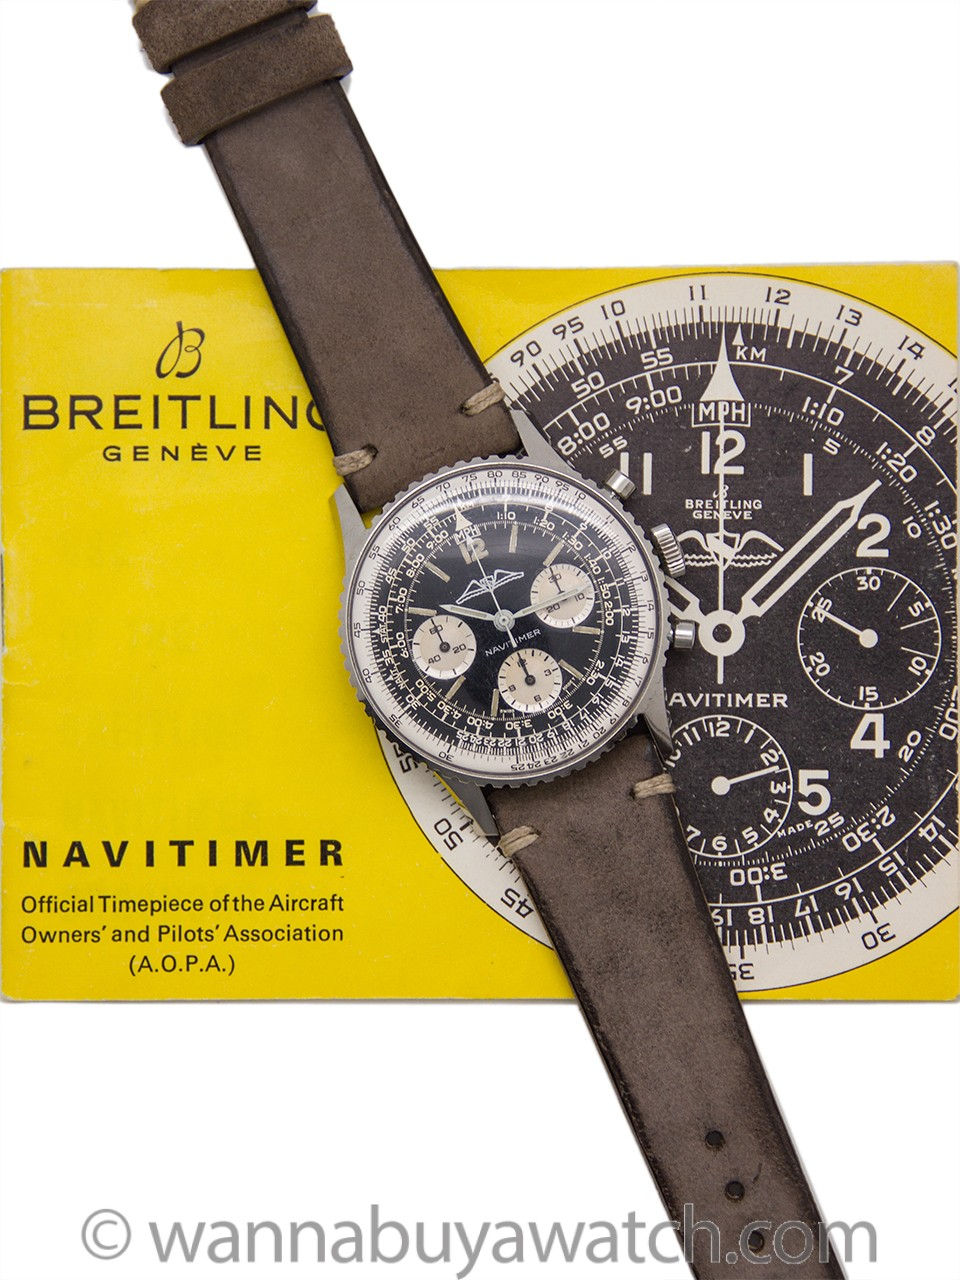 Vintage Breitling Navitimer ref 806 AOPA circa 1960's Box & Booklet